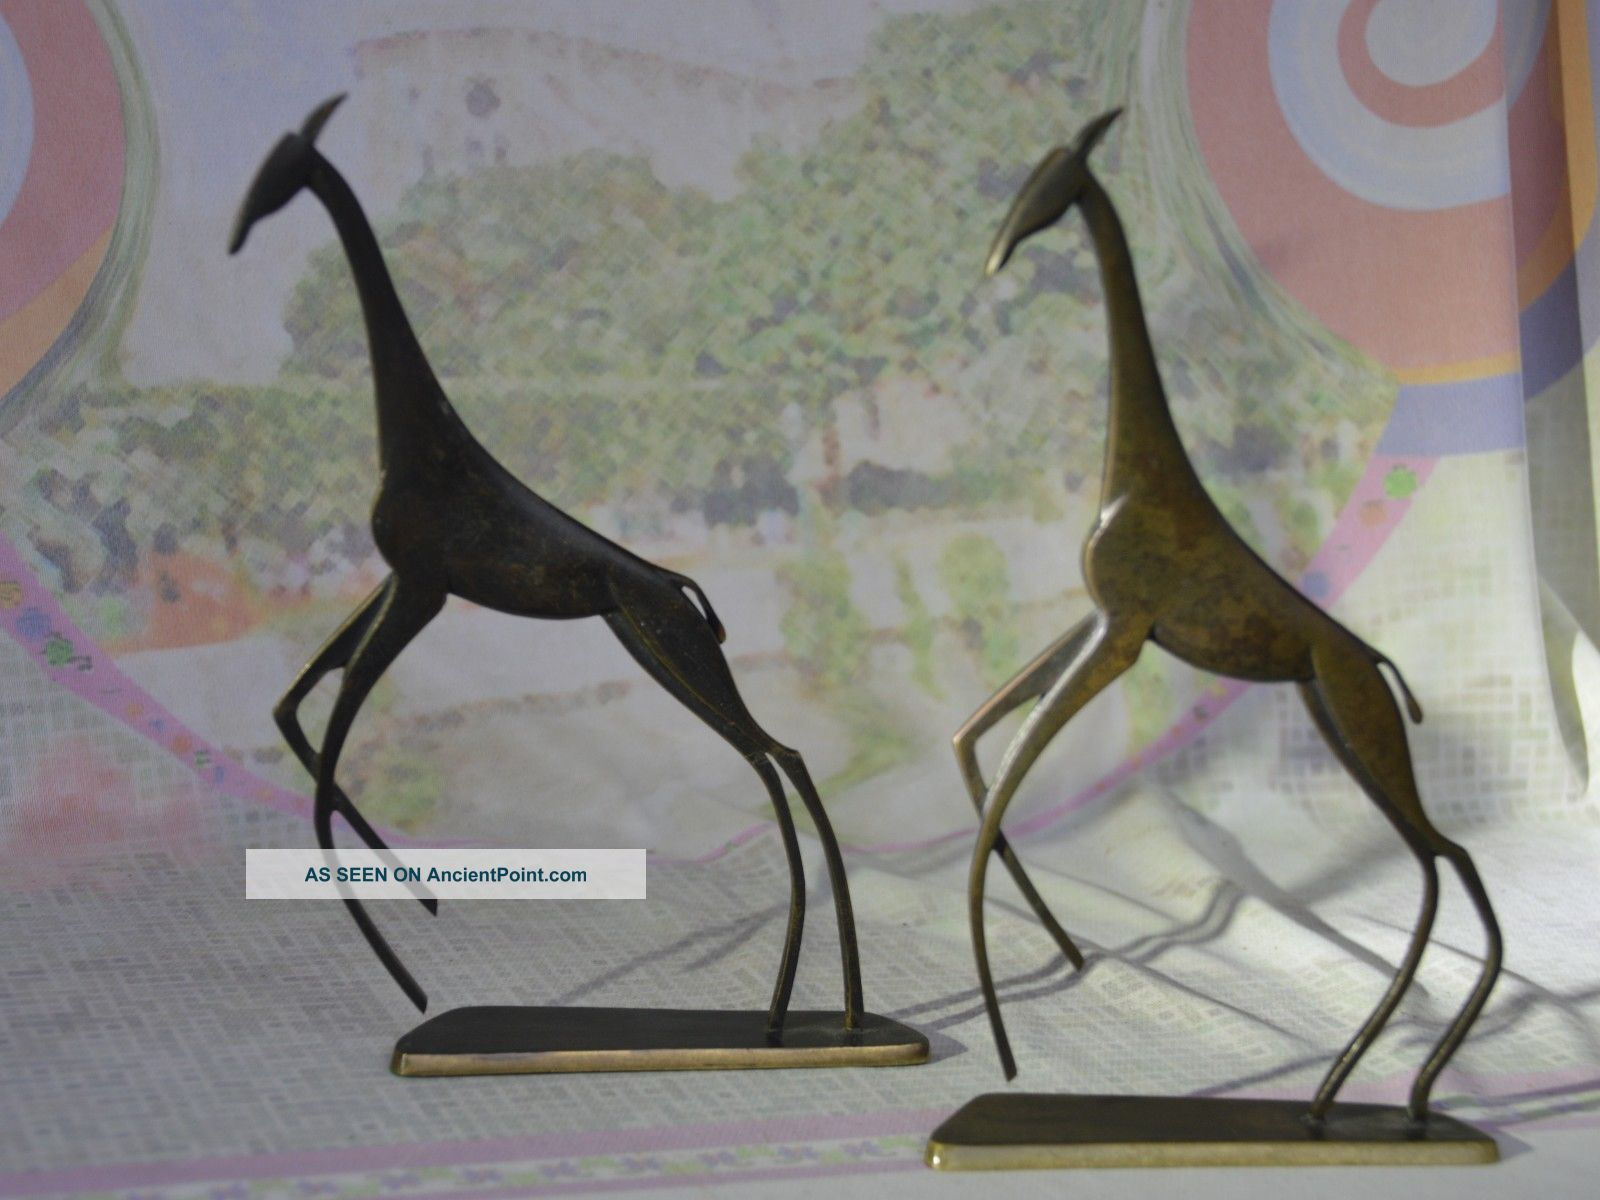 Hagenauer,  Giraffes.  Wien,  Vienna,  Werkstätten,  1940s,  & Richard Rohac Giraffe Art Deco photo